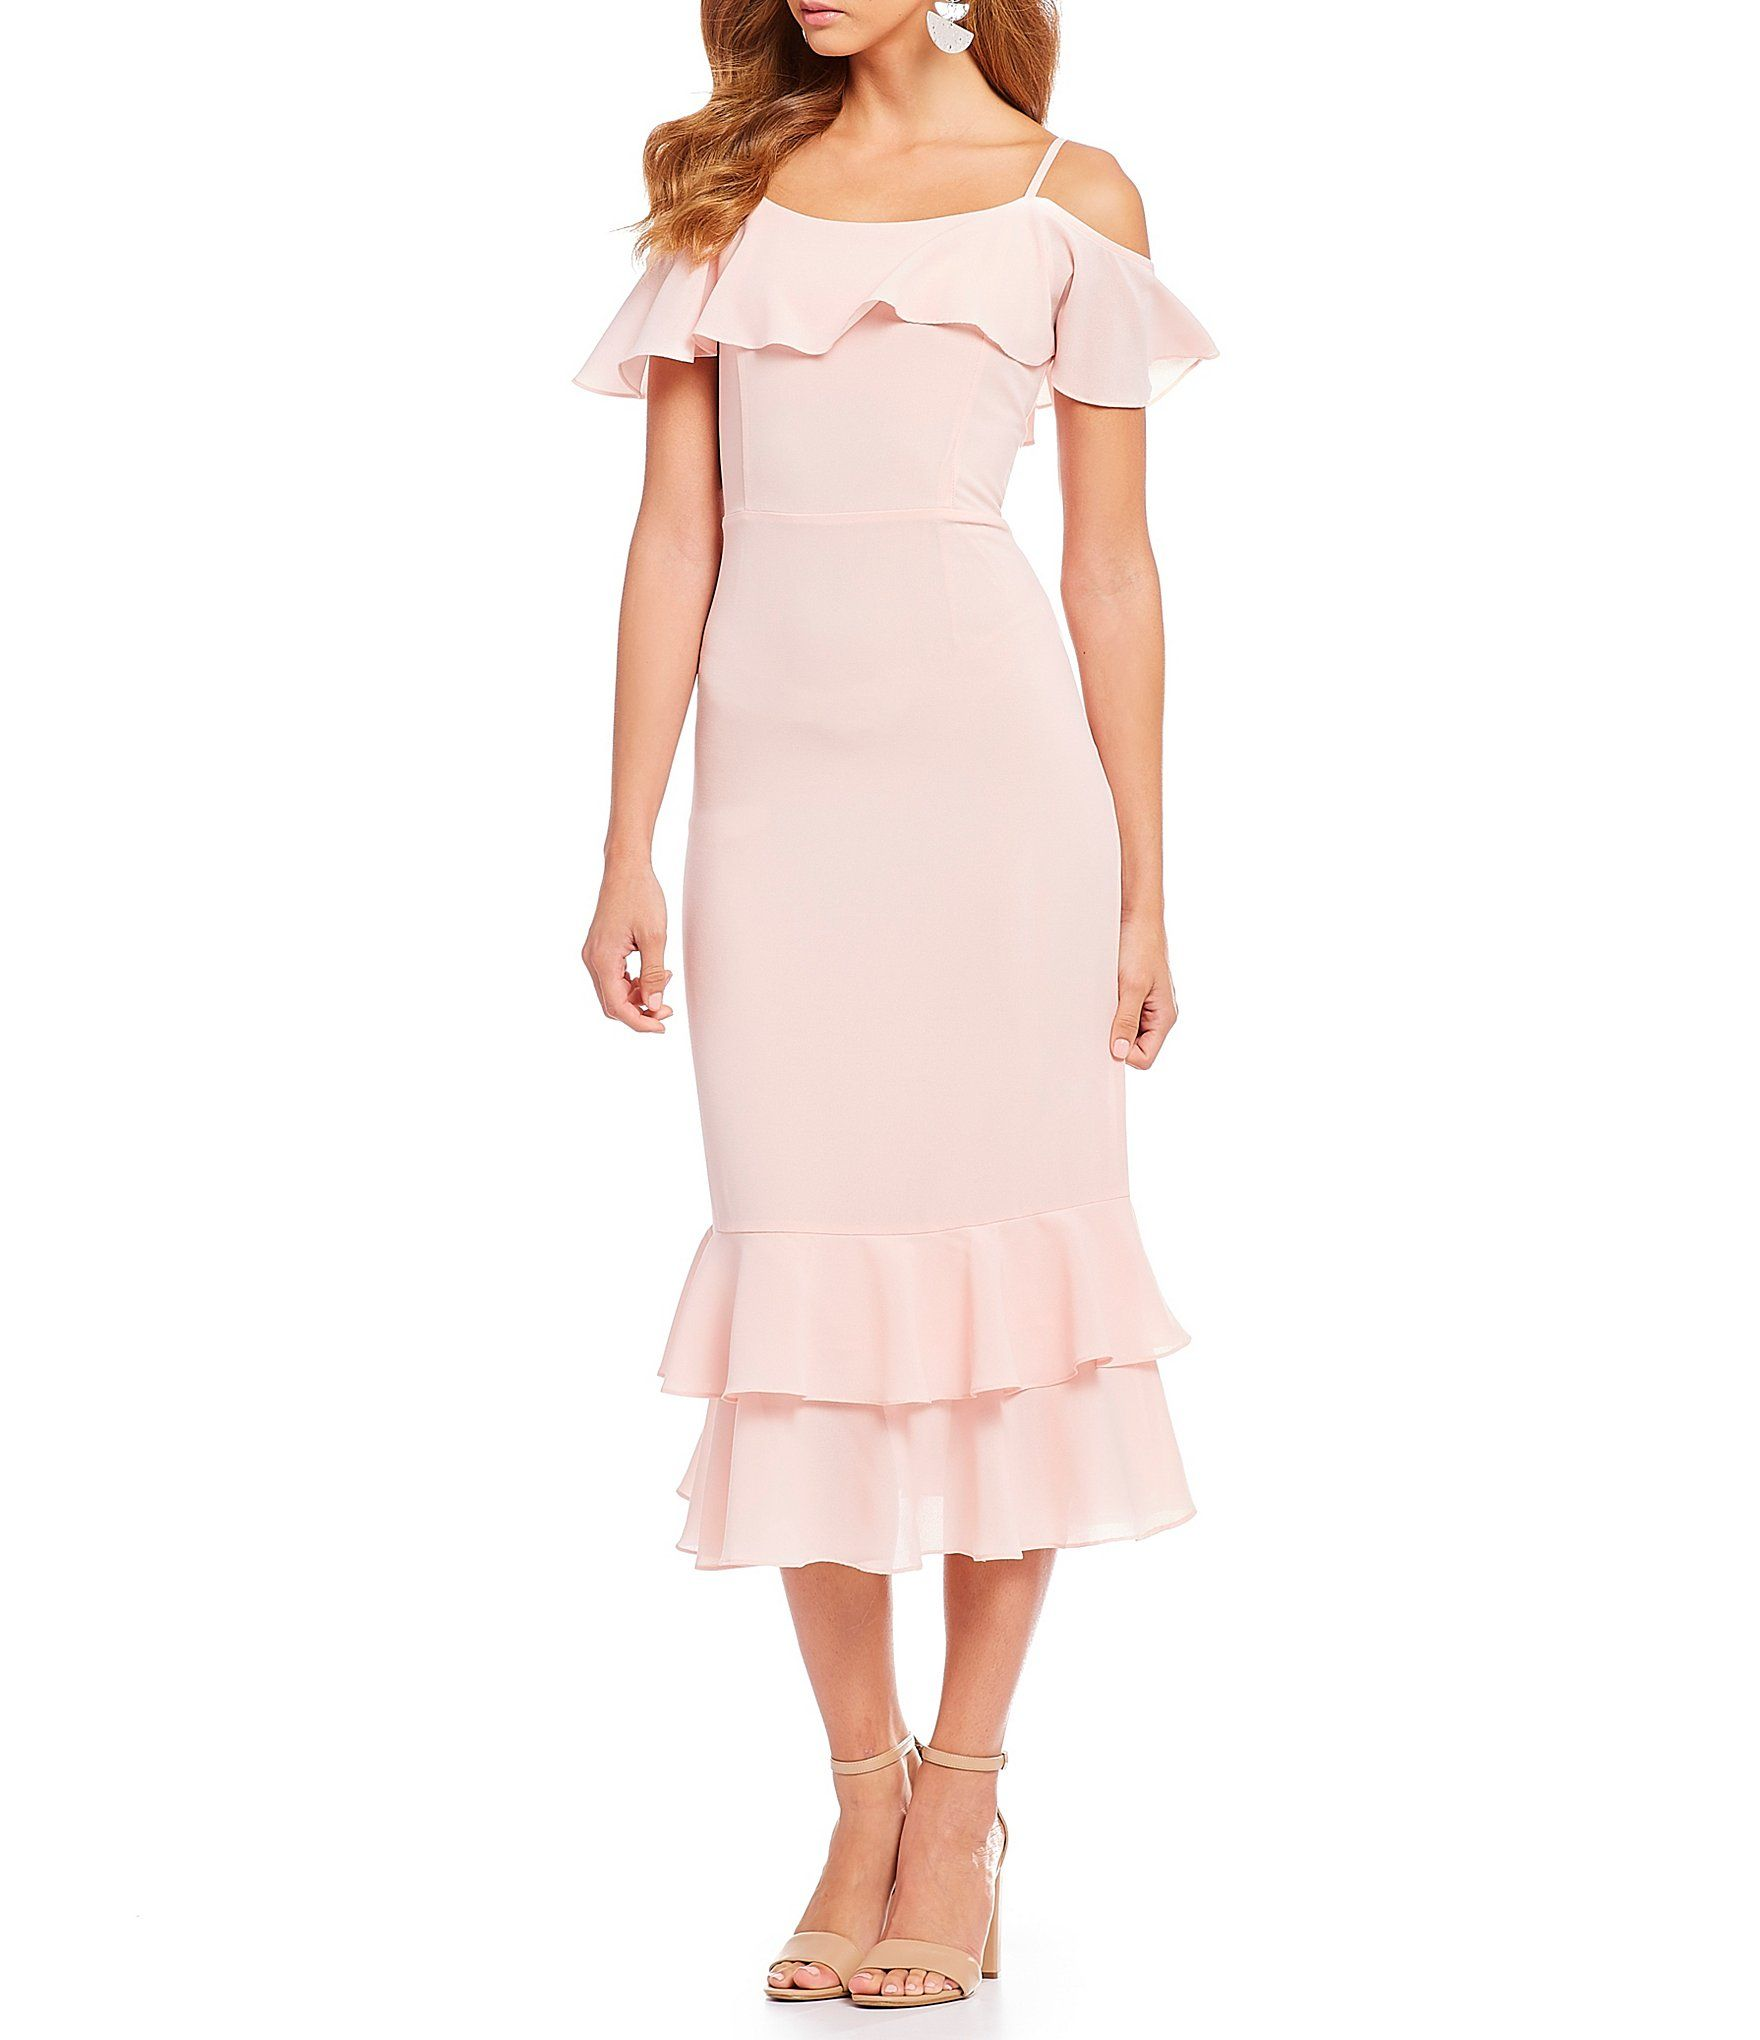 c0cc5dce8a7 Shop for Sugarlips Ruffle Hem Cold Shoulder Midi Dress at Dillards.com.  Visit Dillards.com to find clothing